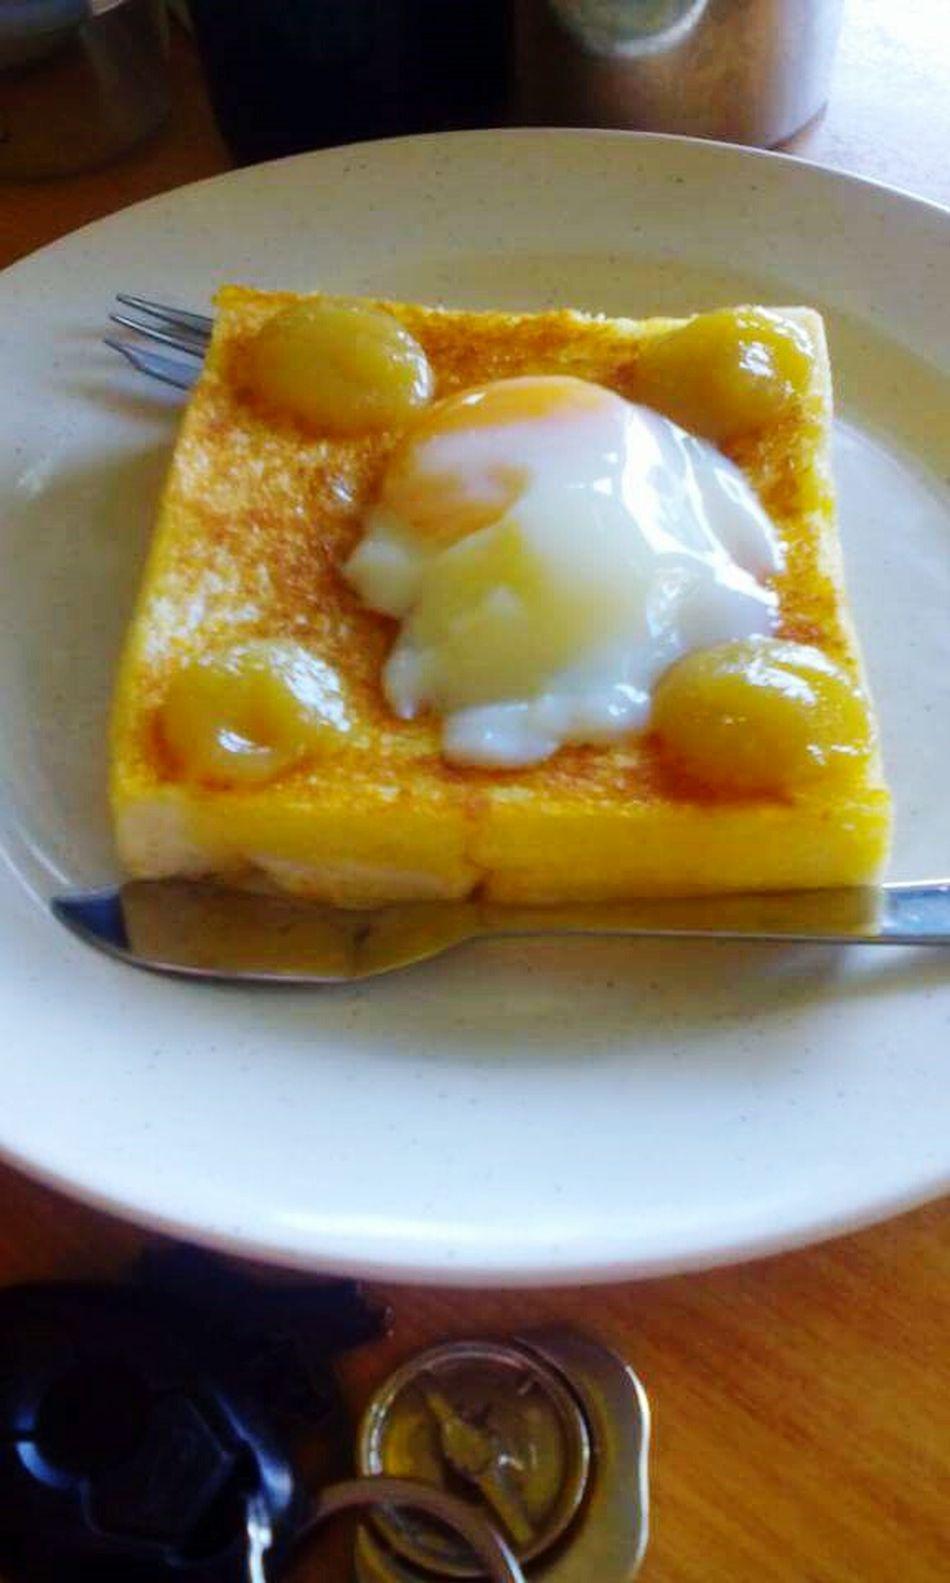 Tibtab at Kelantan Darul Naim, Malaysia Kelantanfood First Eyeem Photo